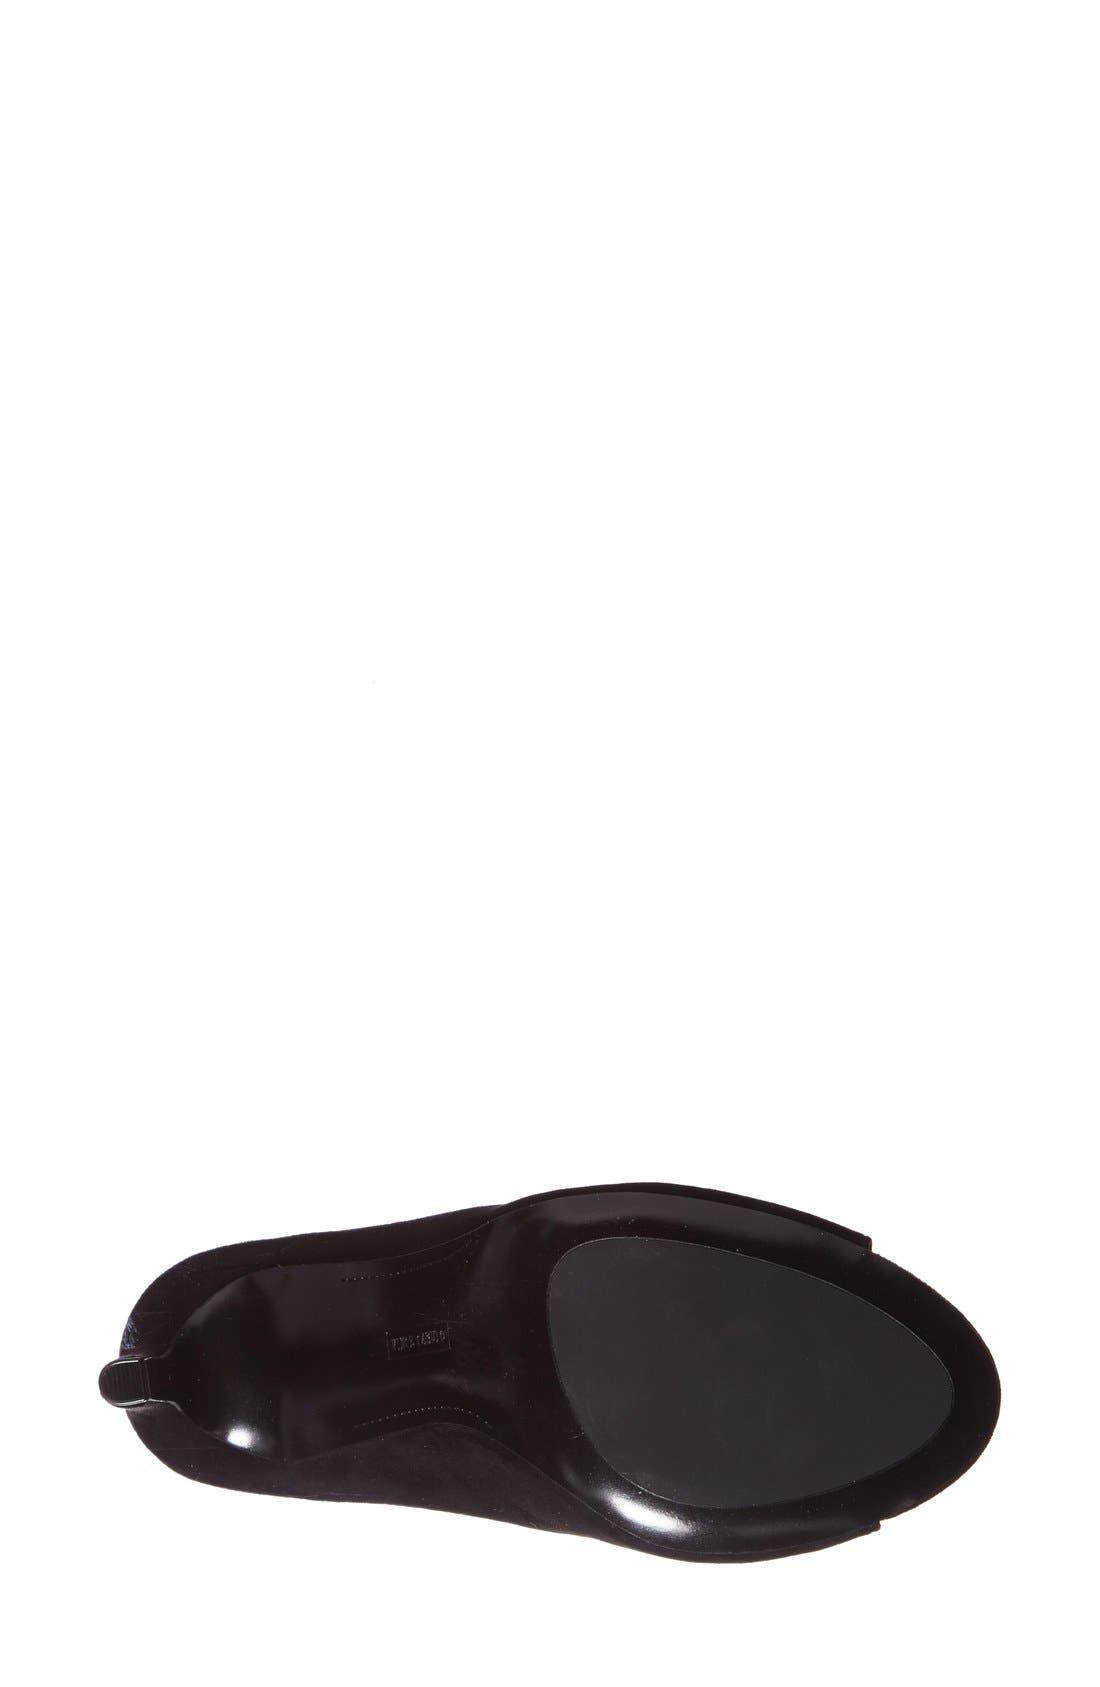 'Karolynn' Leather Pump,                             Alternate thumbnail 4, color,                             001